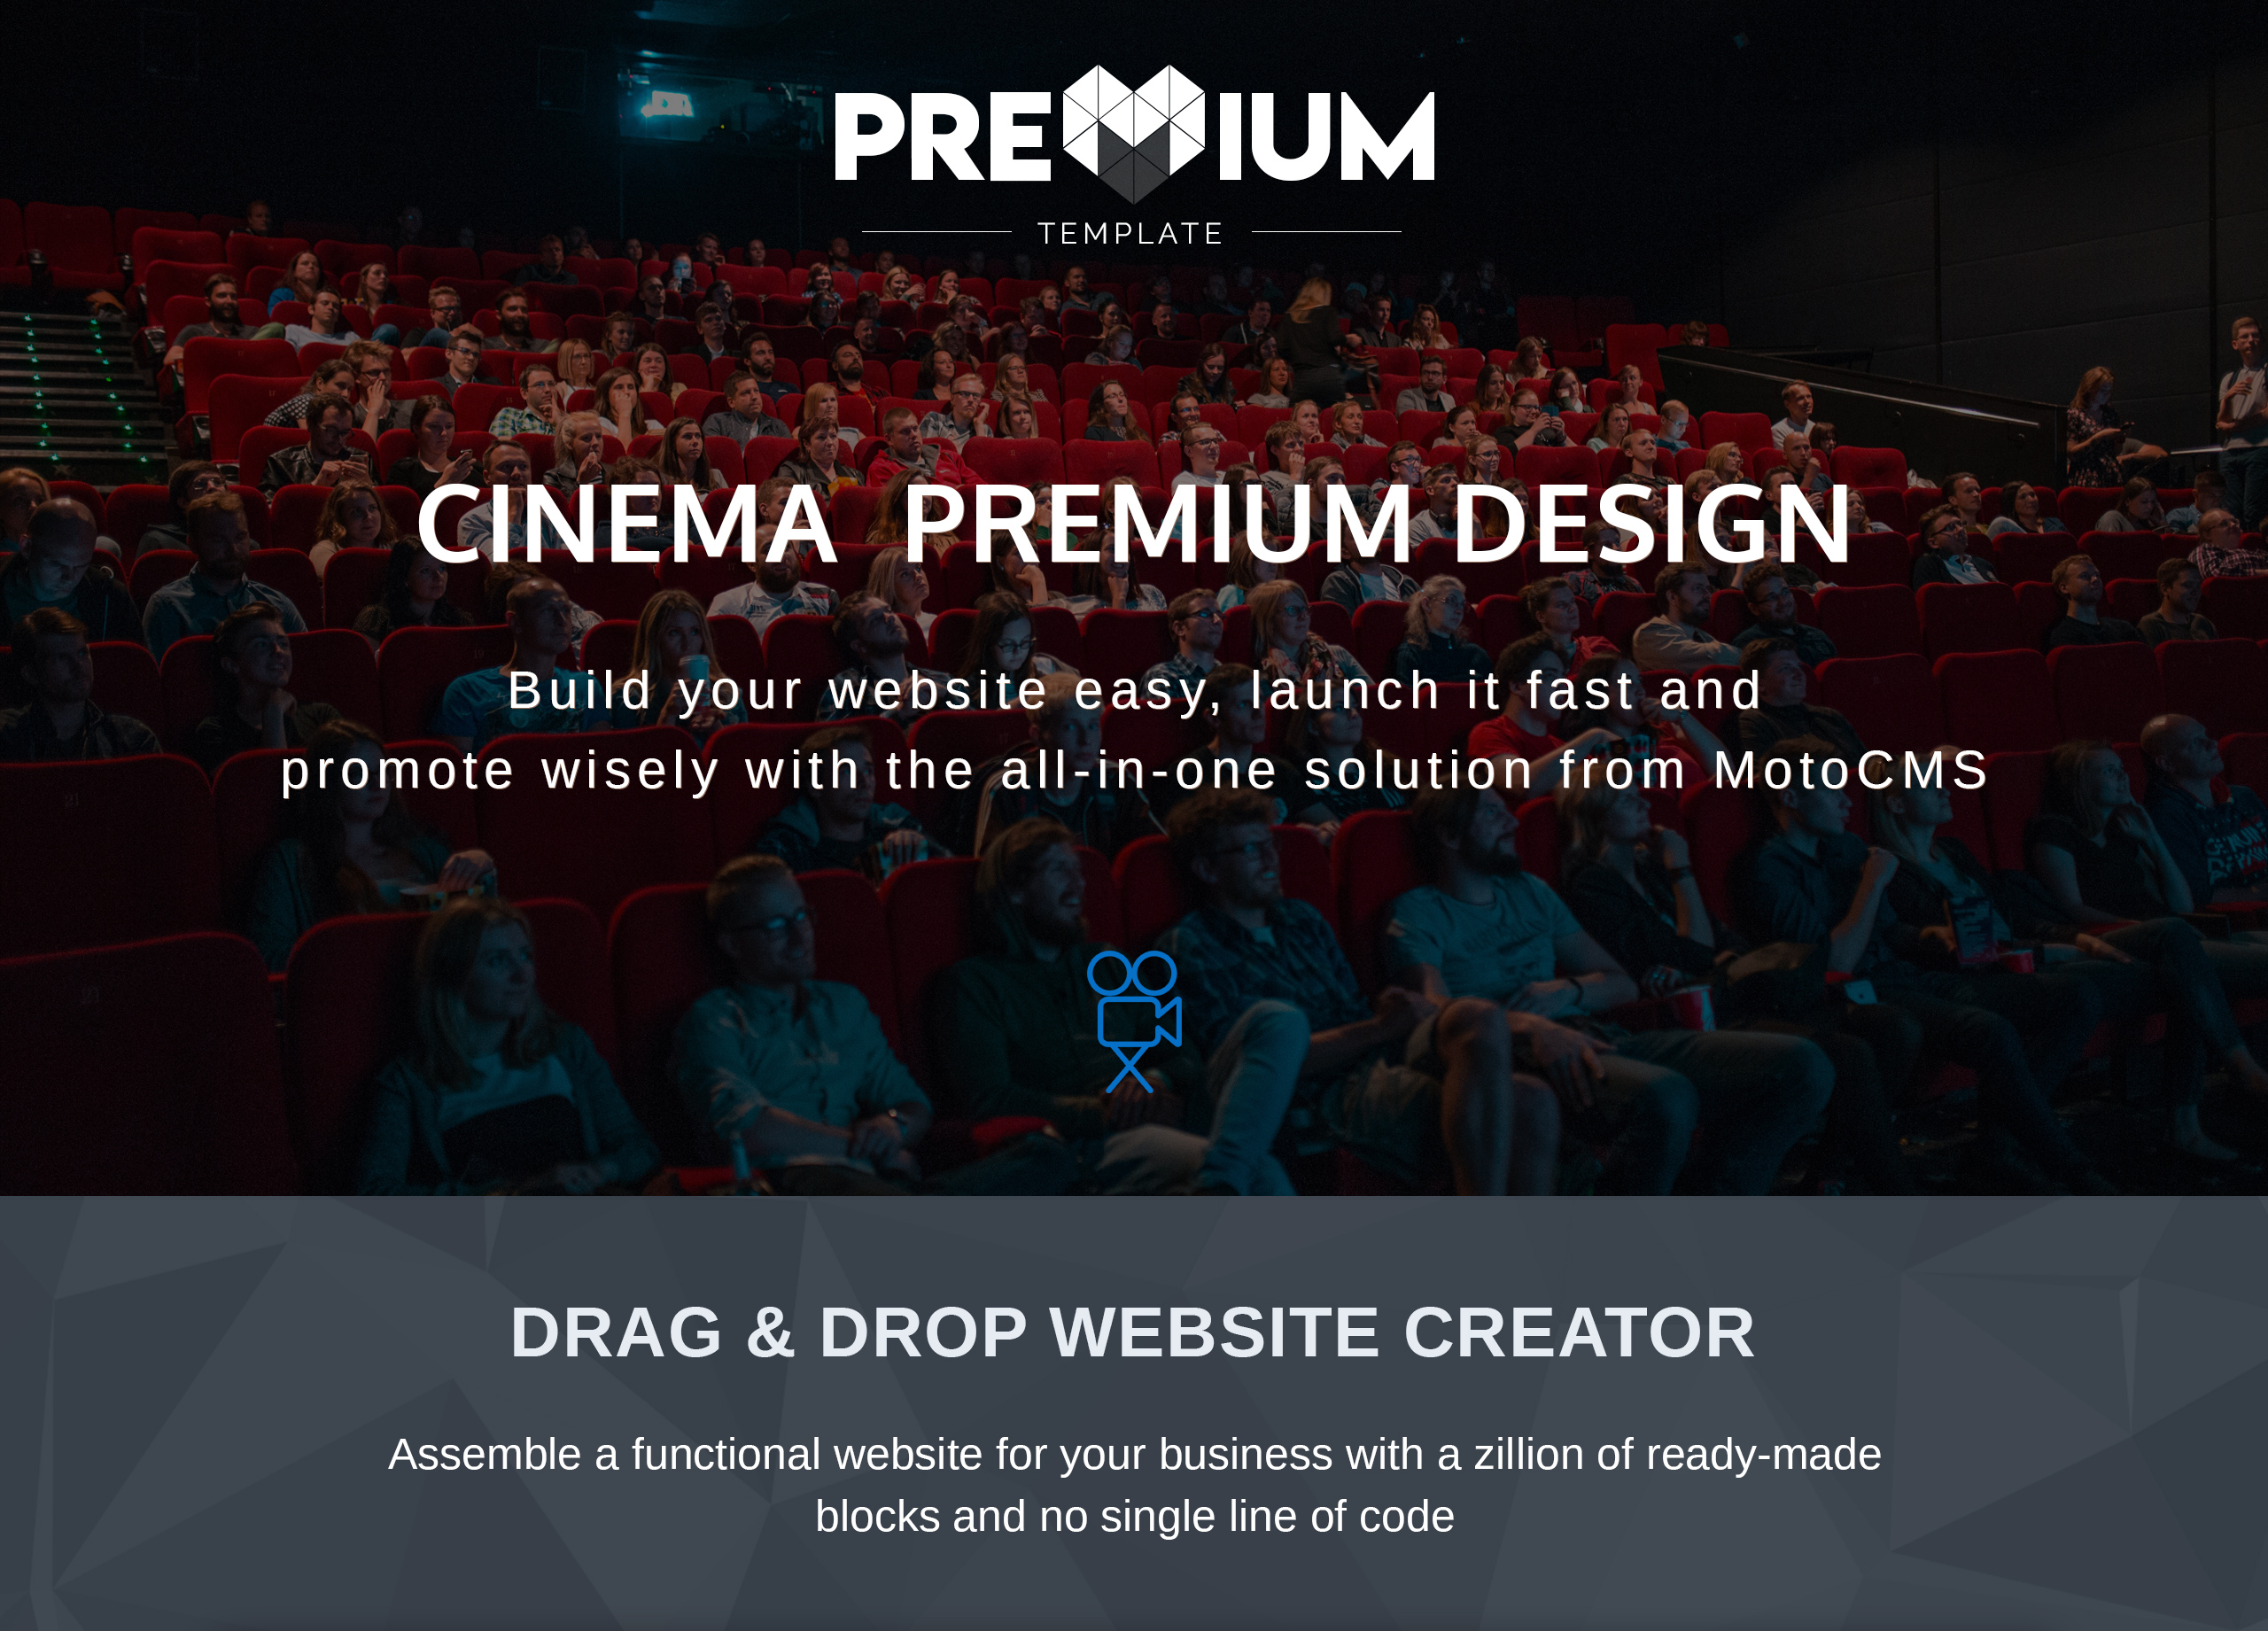 Cinema Website Design for Movie Theater Websites - MotoCMS